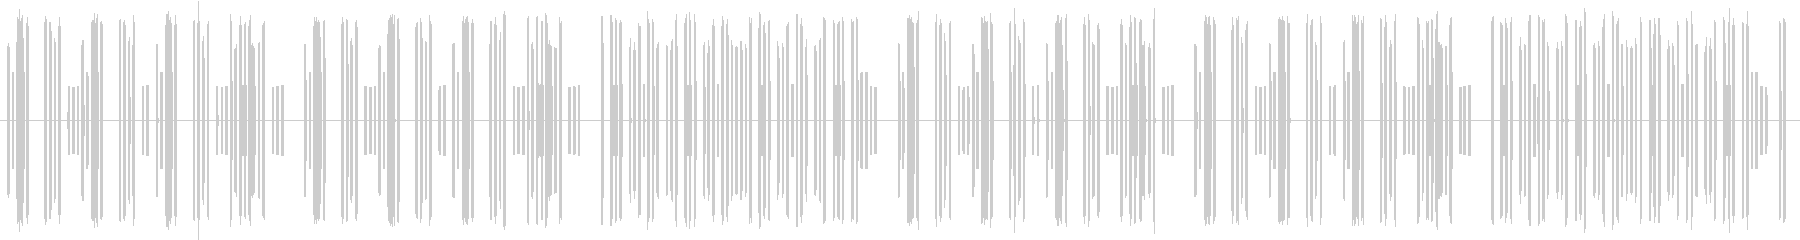 8bit風コミカルBGM2の未再生の波形